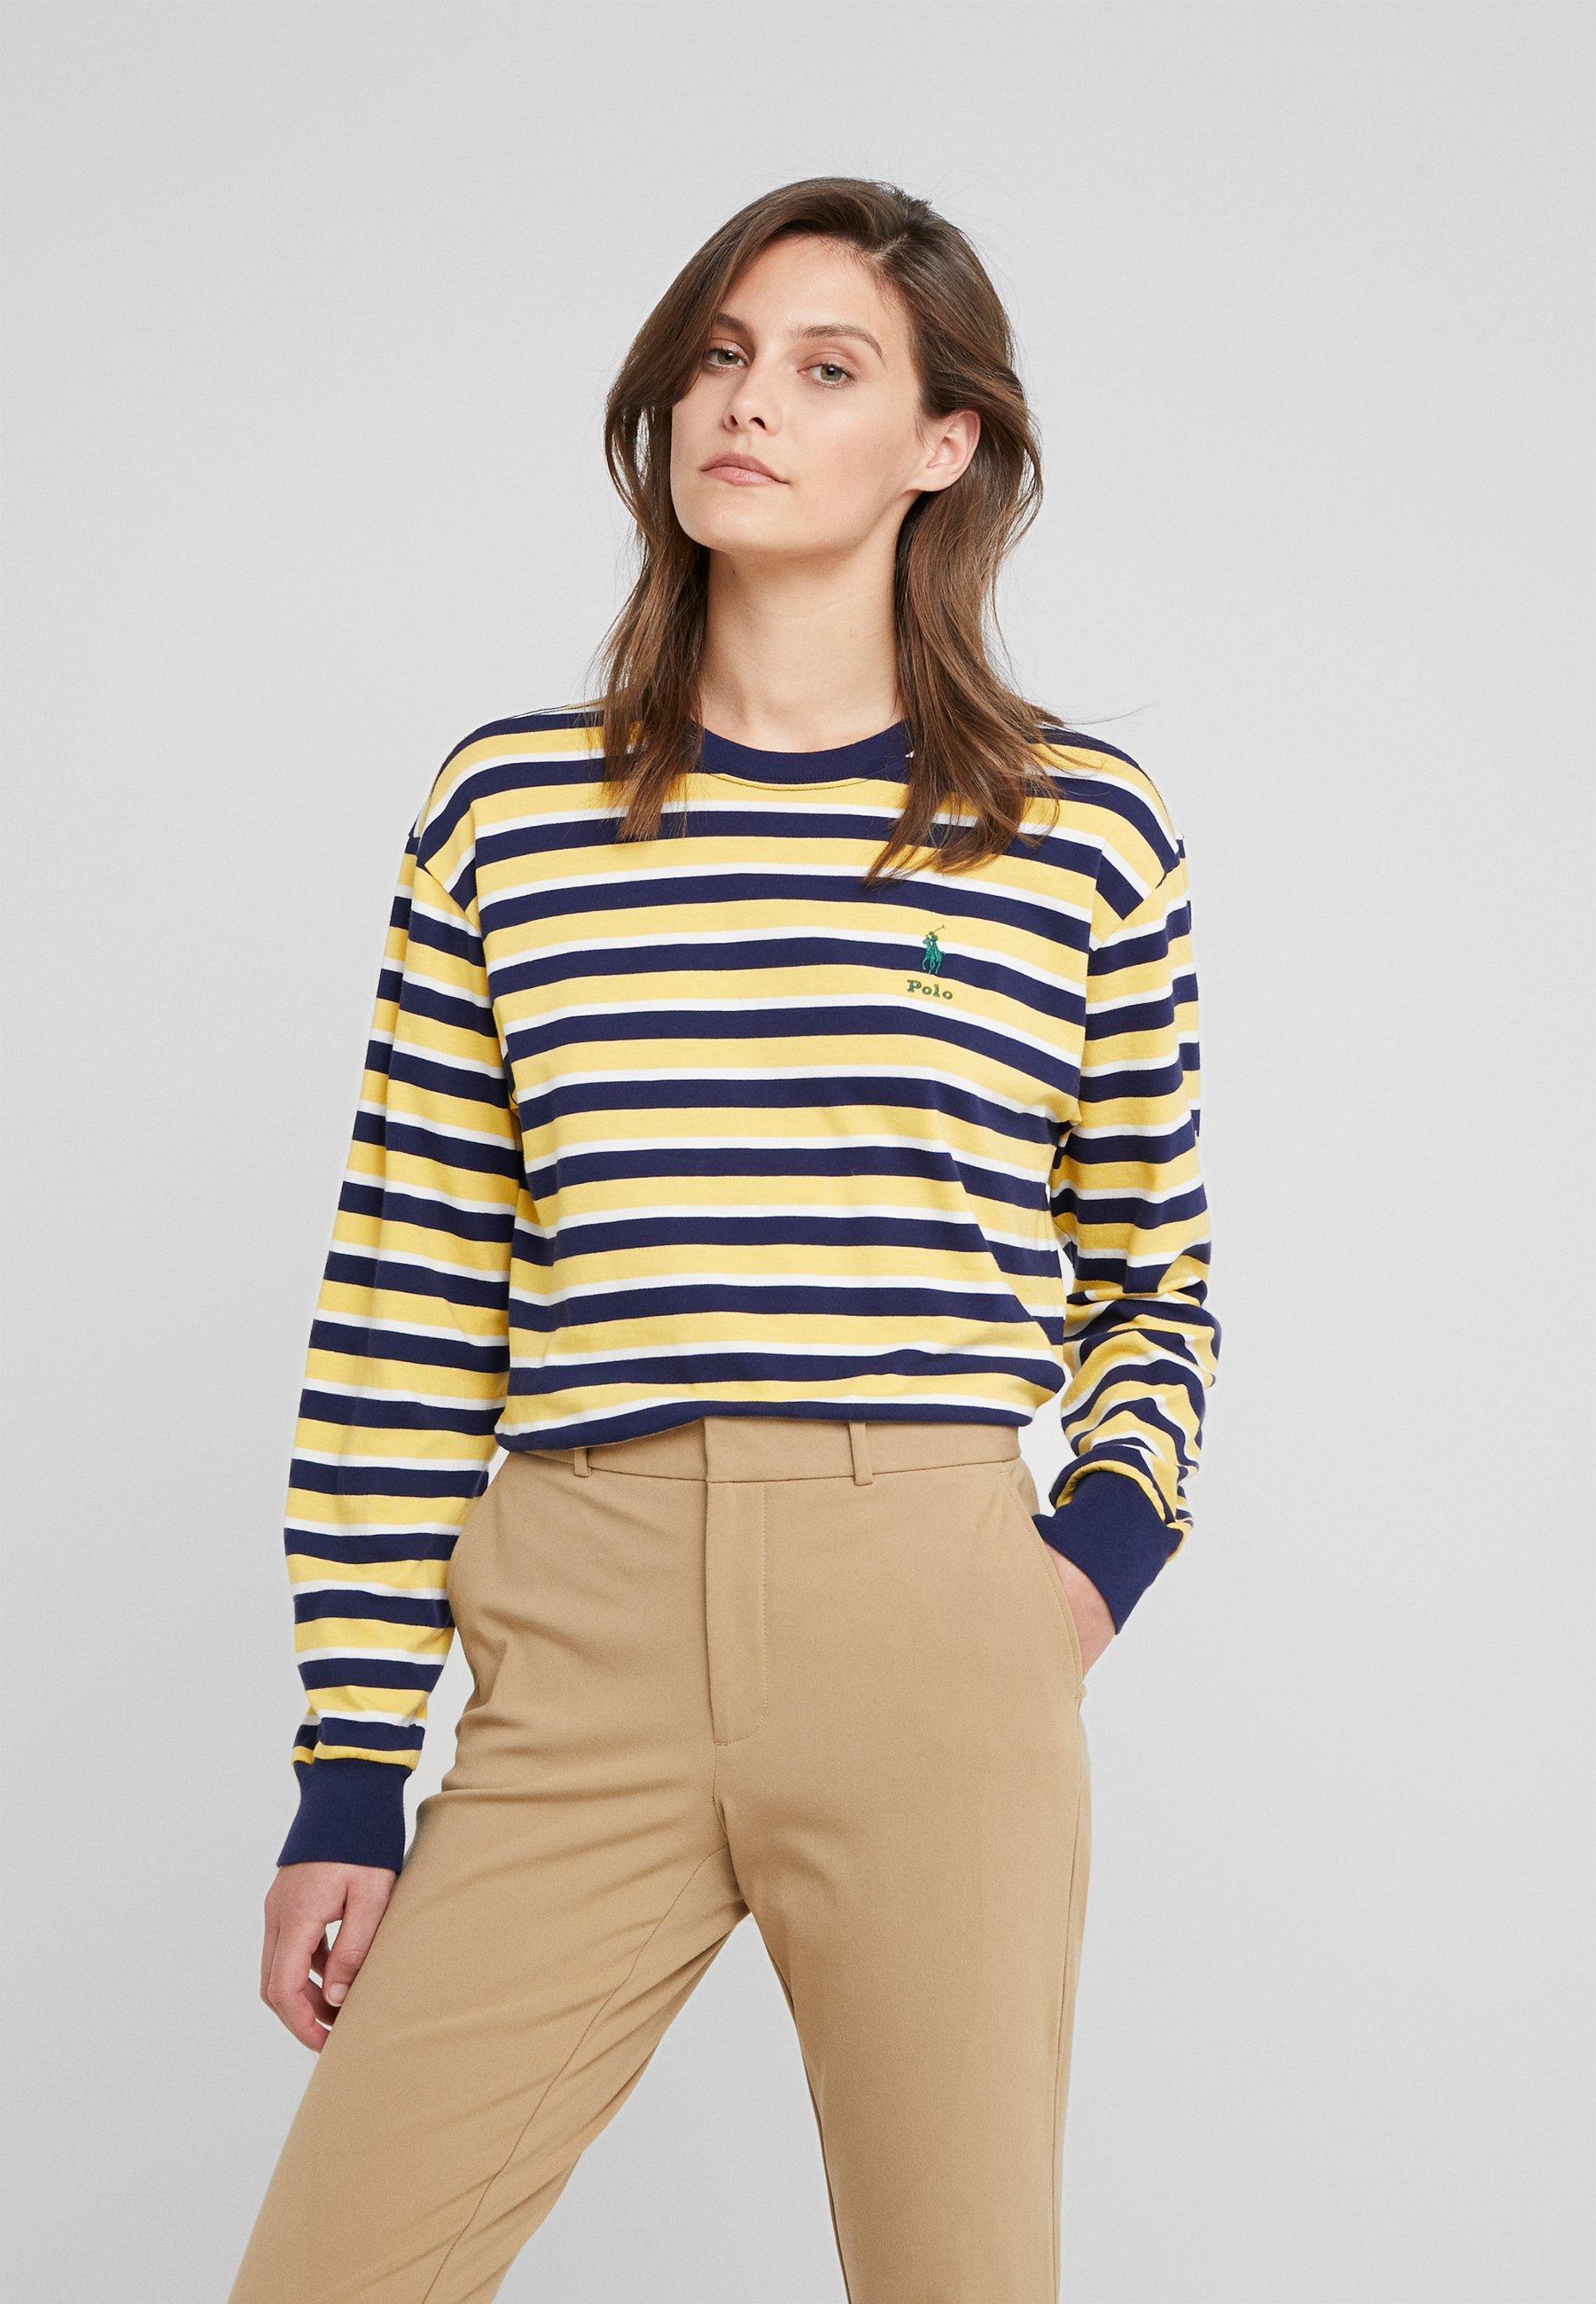 À Manches Polo Ralph LonguesYellow T Lauren shirt TFlKJ1c